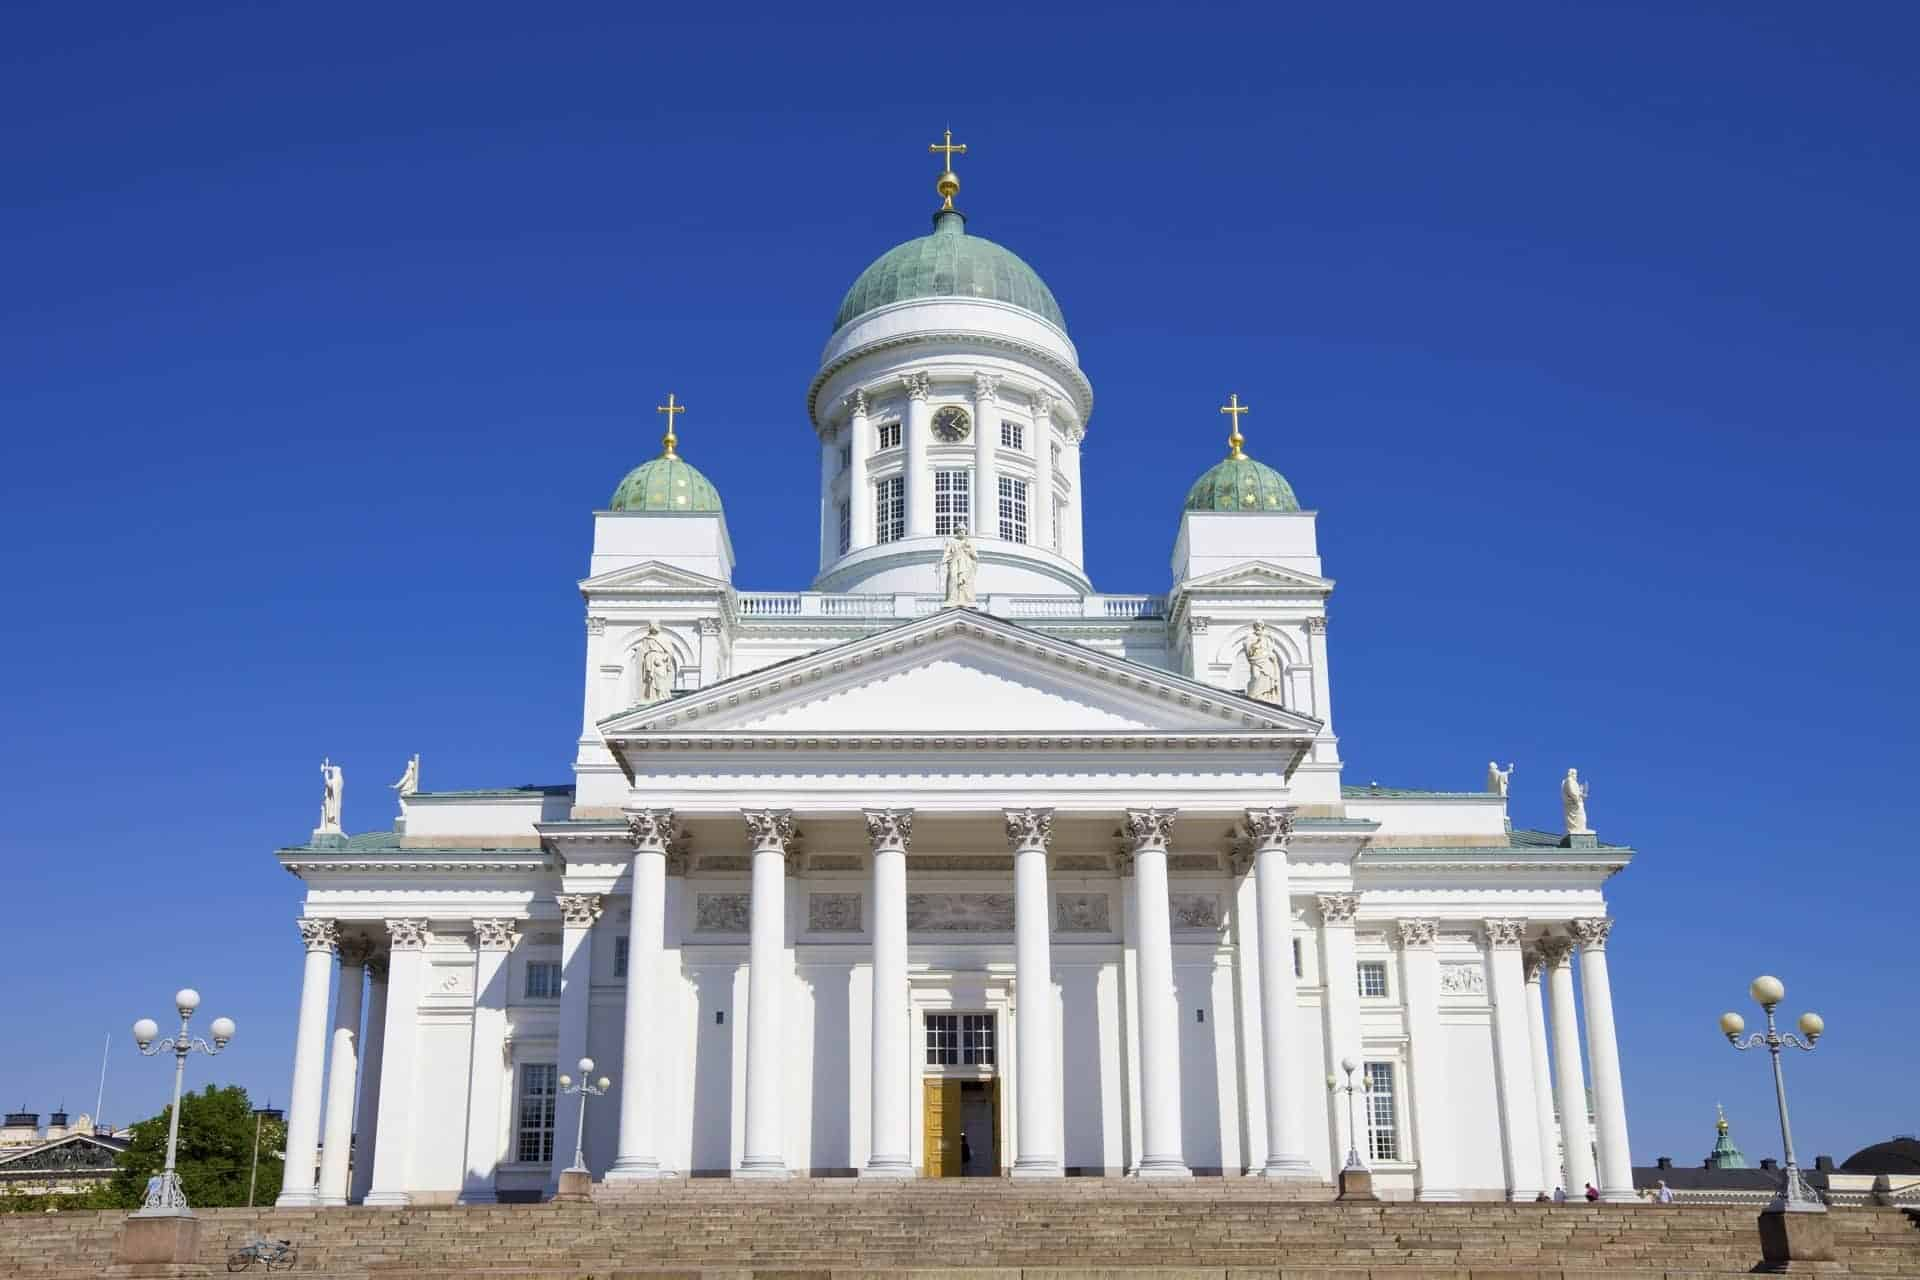 Cathedral on Senate Square Helsinki, Finland